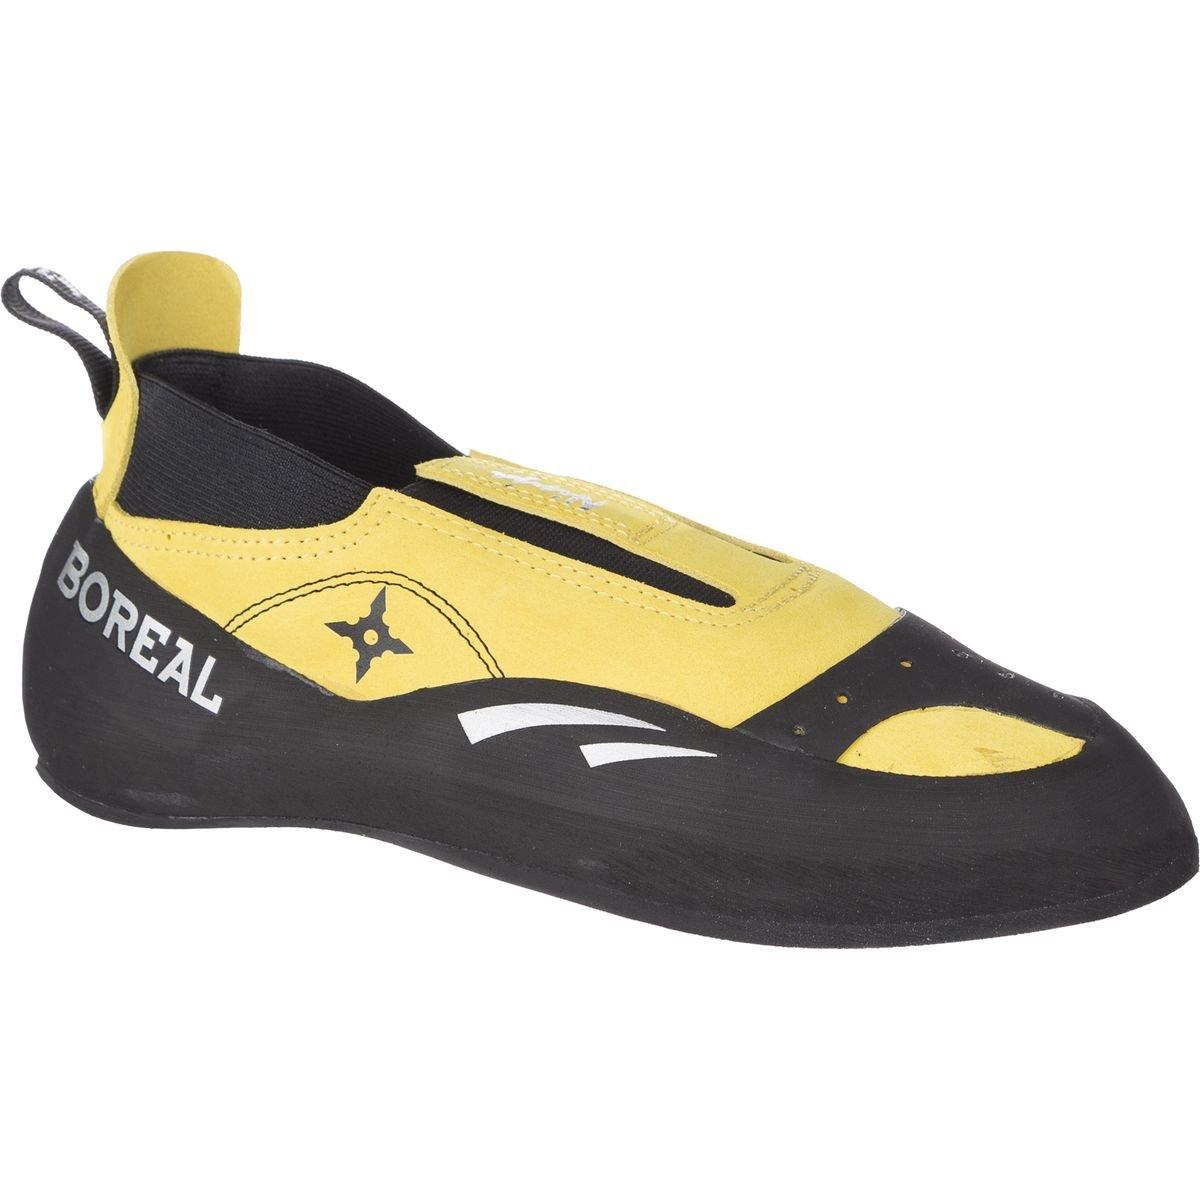 Boreal Ninja Climbing Shoe One Color, US 9.5/UK 8.5